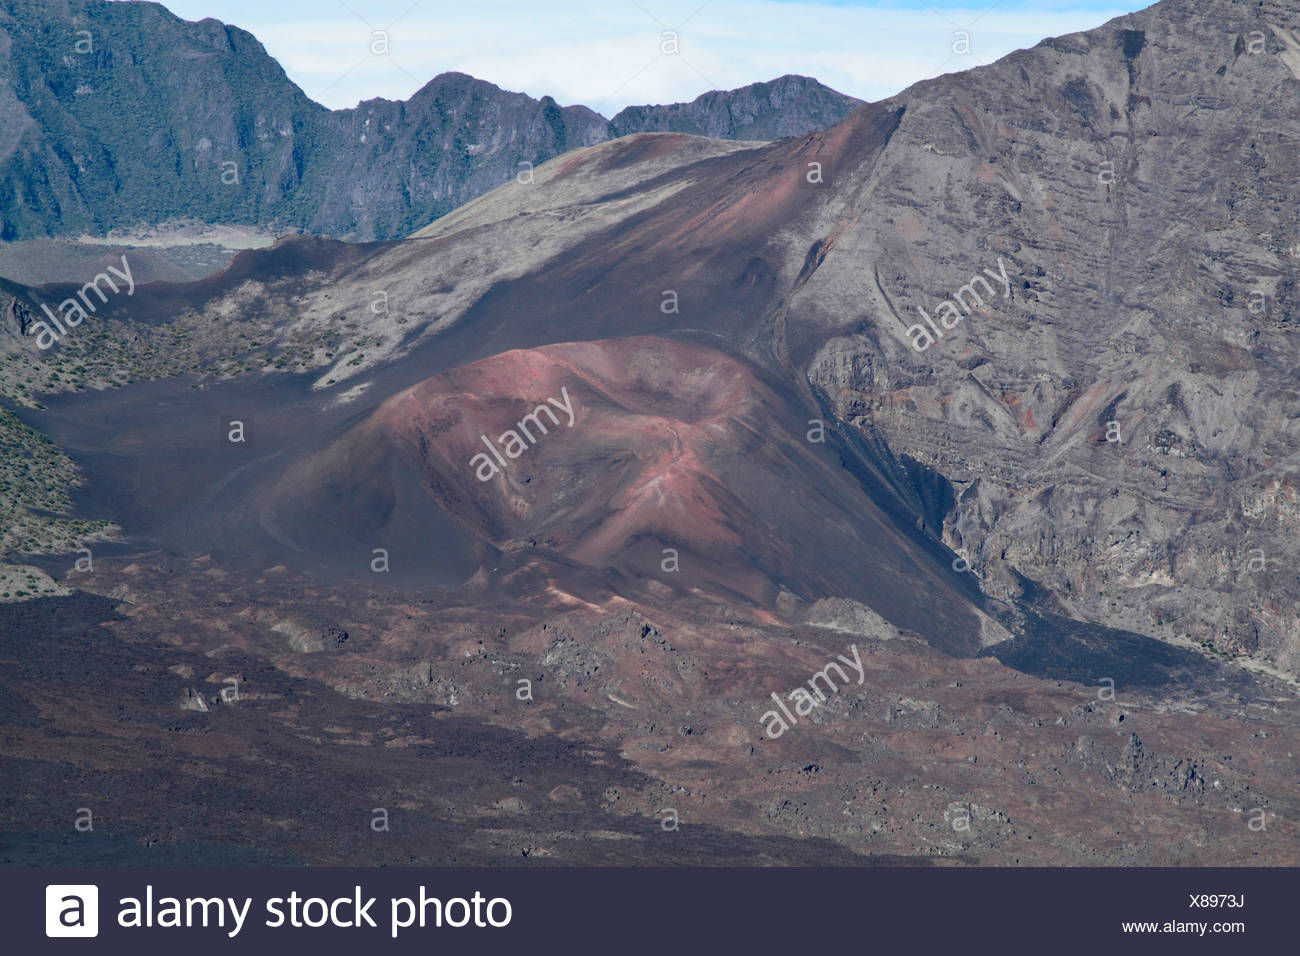 volcanic cone in the crater of Haleakala, USA, Hawaii, Maui Stock Photo